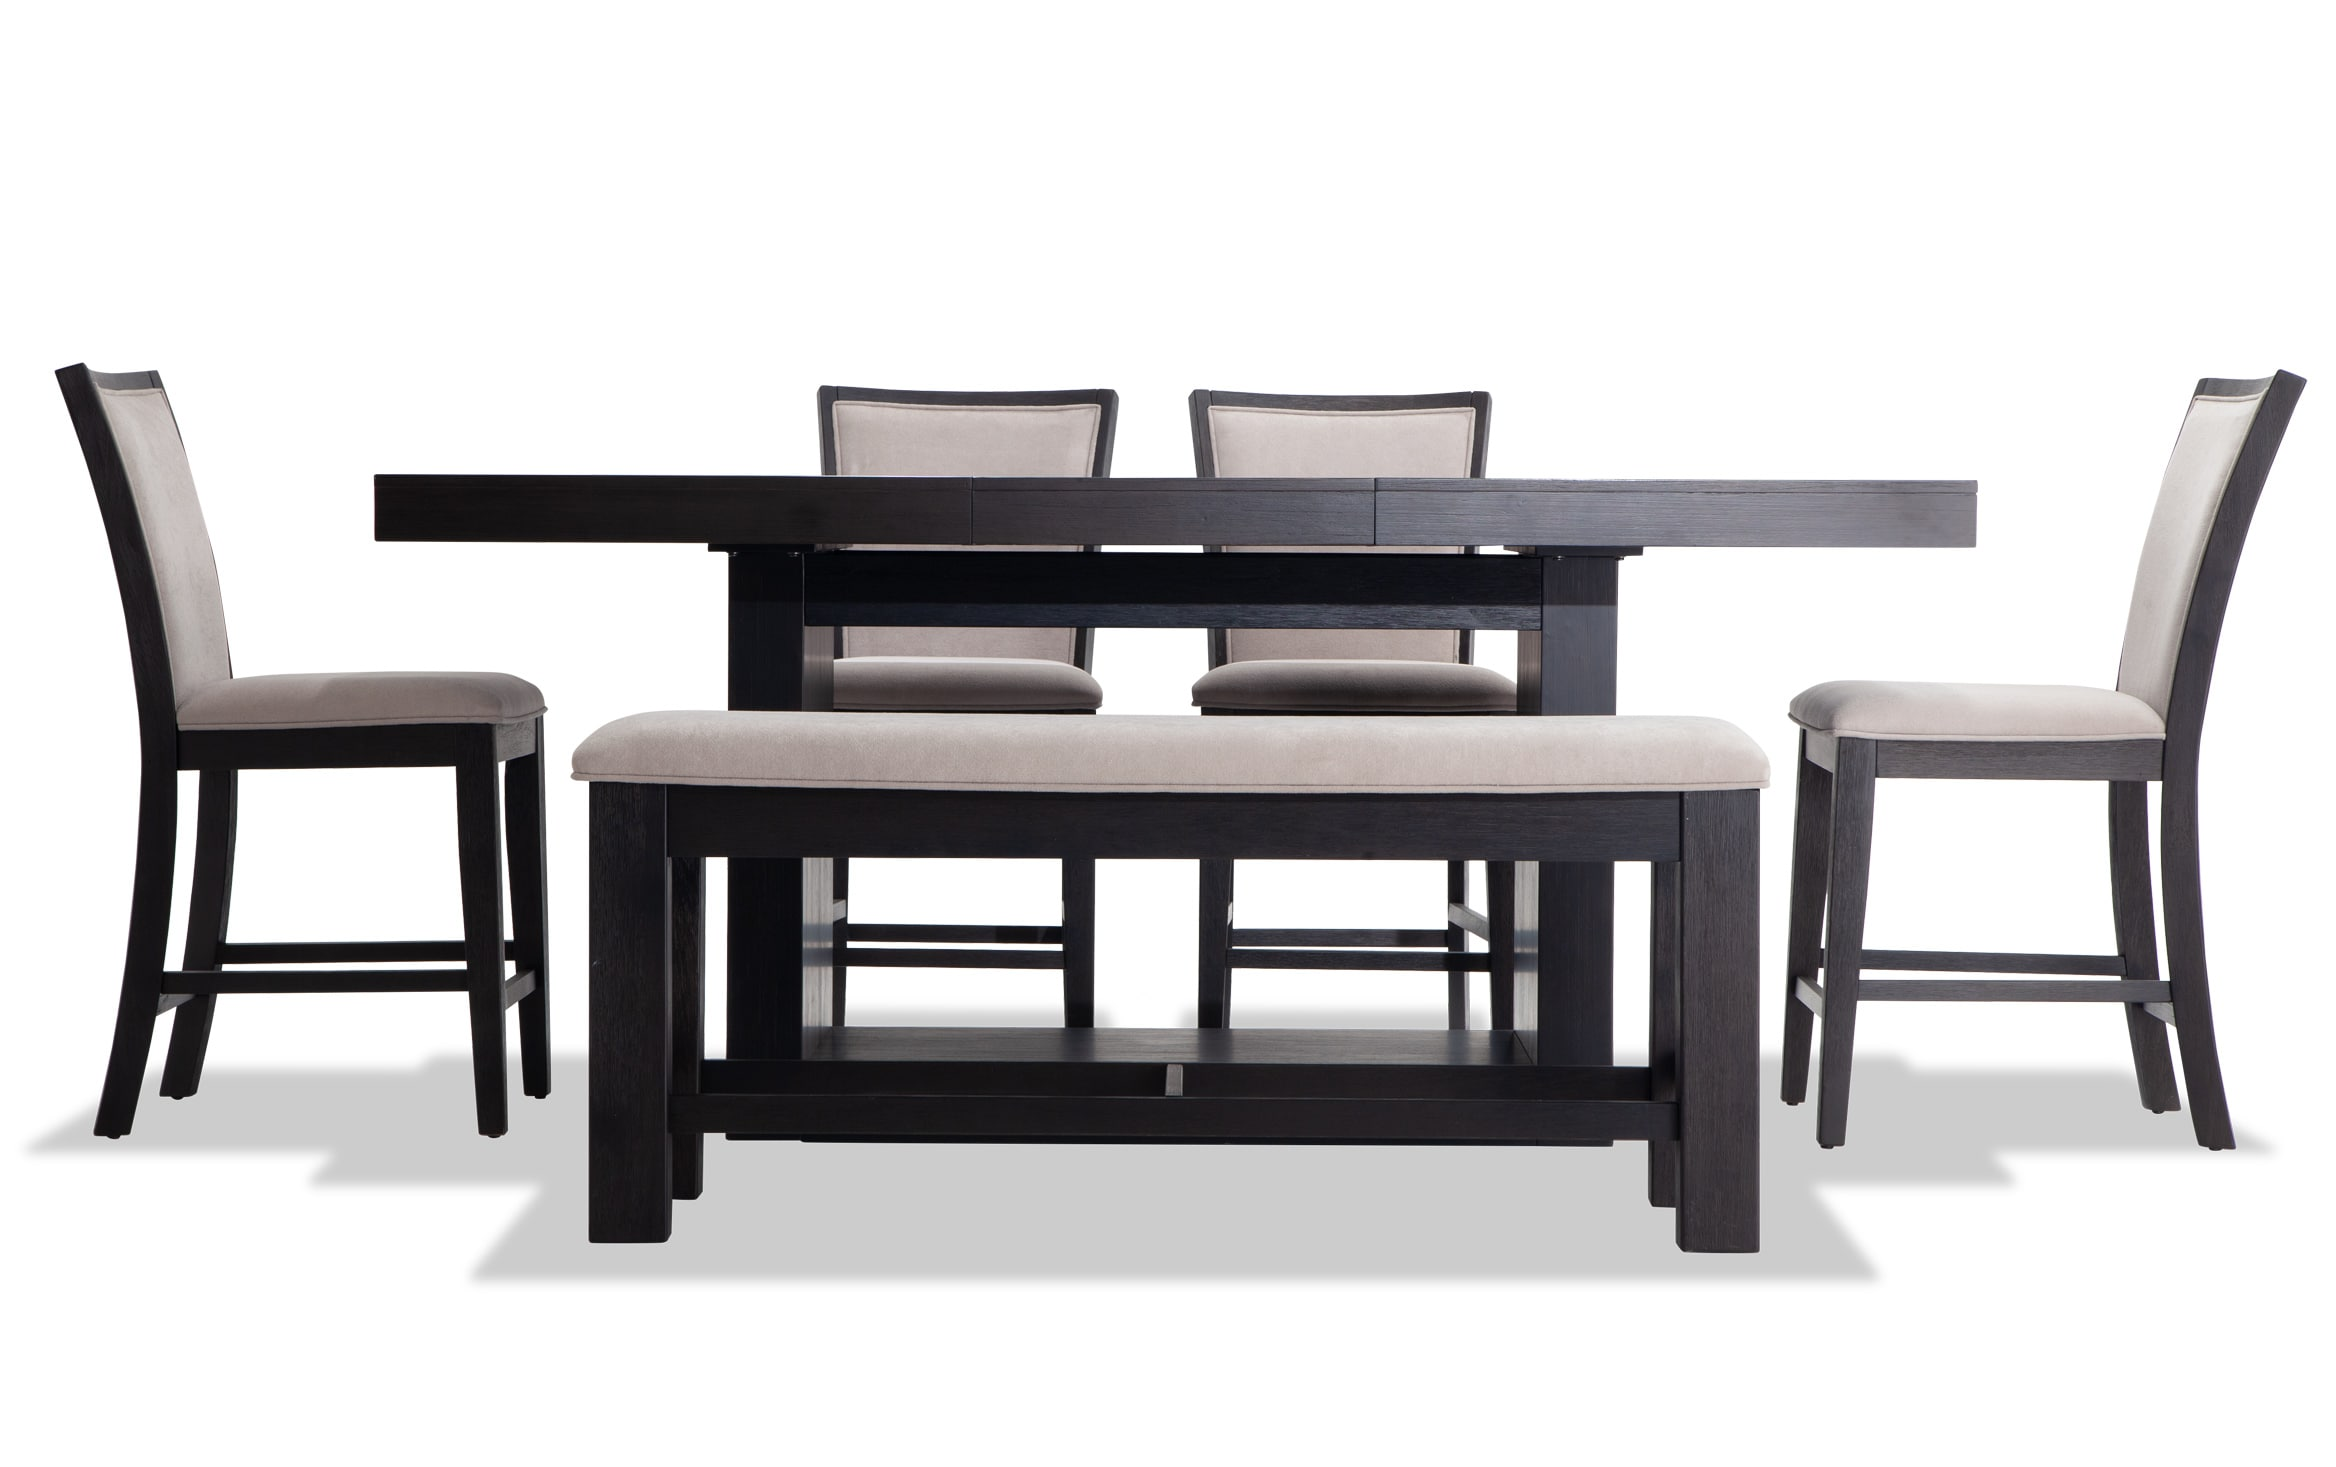 Cosmopolitan 9 Piece Counter Set with Bench